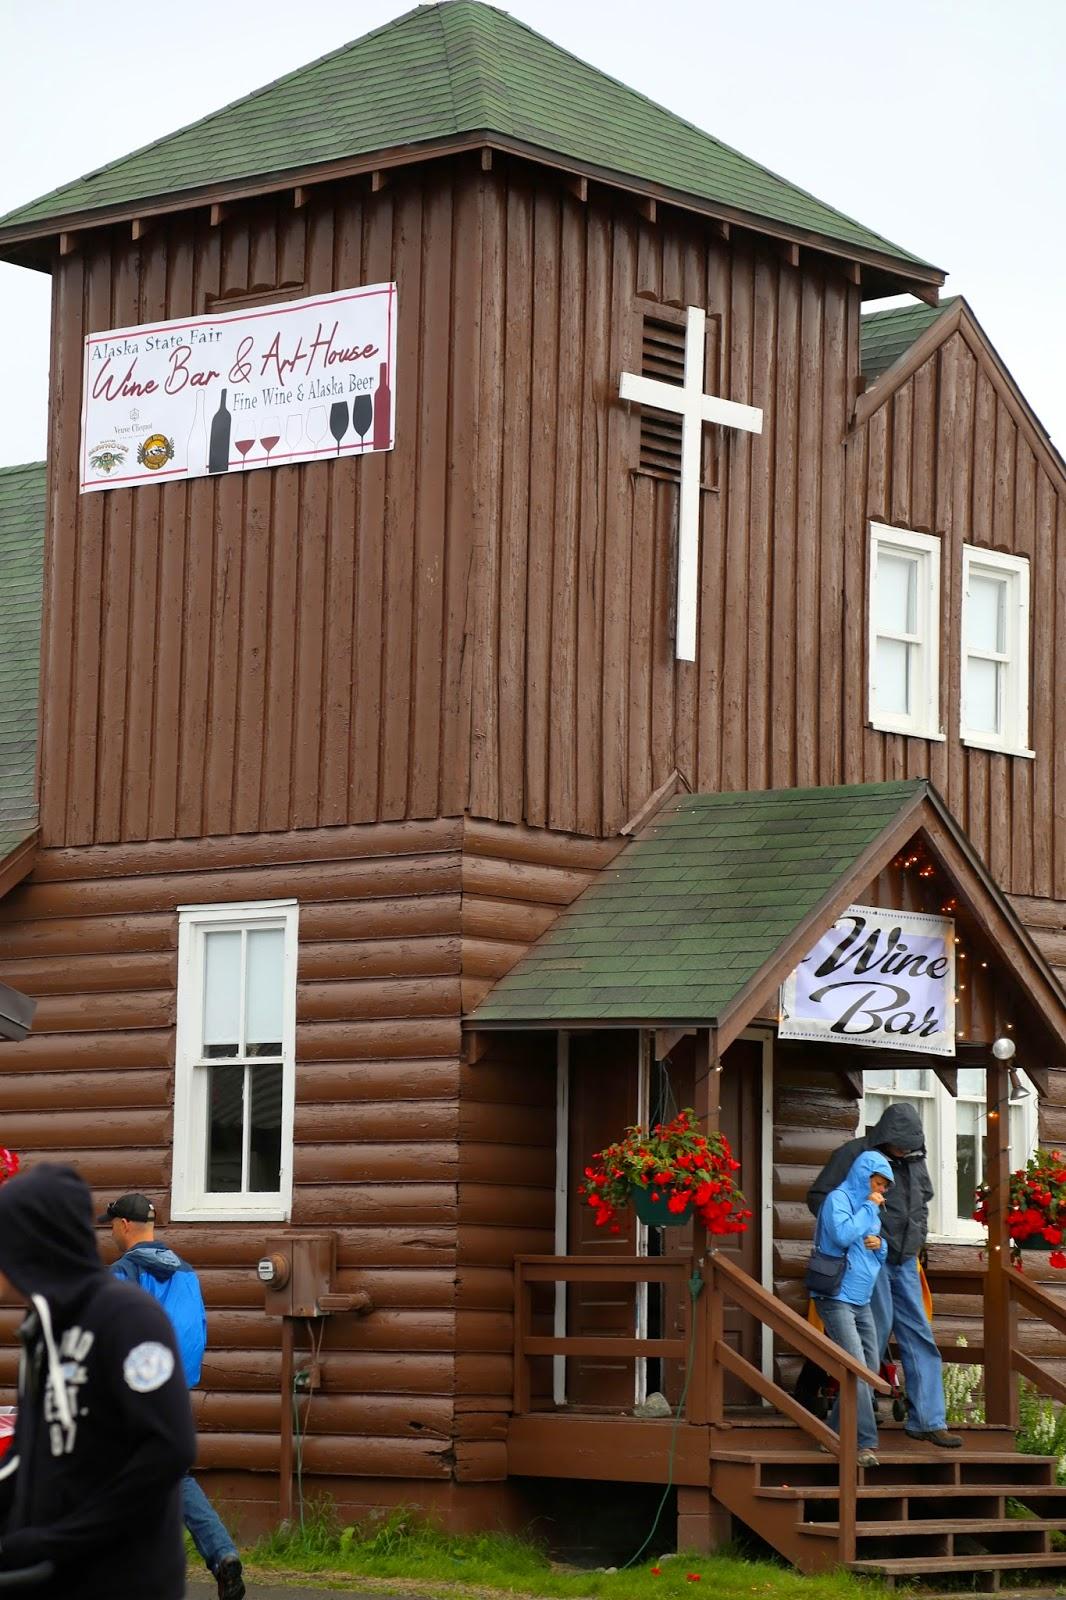 wine bar in a chapel, Alaska State Fair